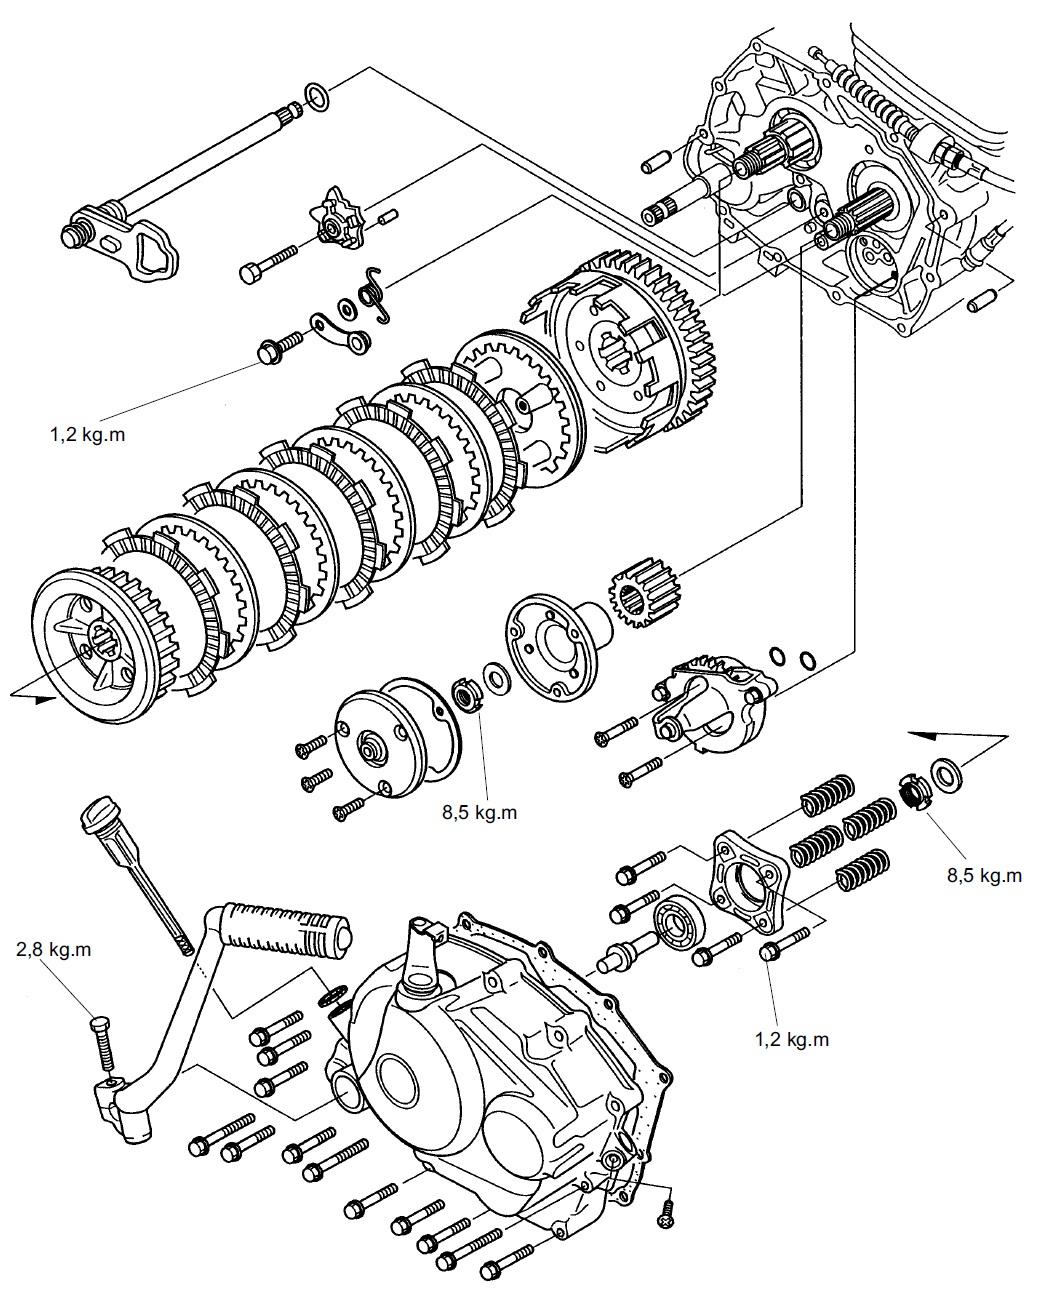 [DIAGRAM] Toyota Mr2 Workshop Wiring Diagram FULL Version